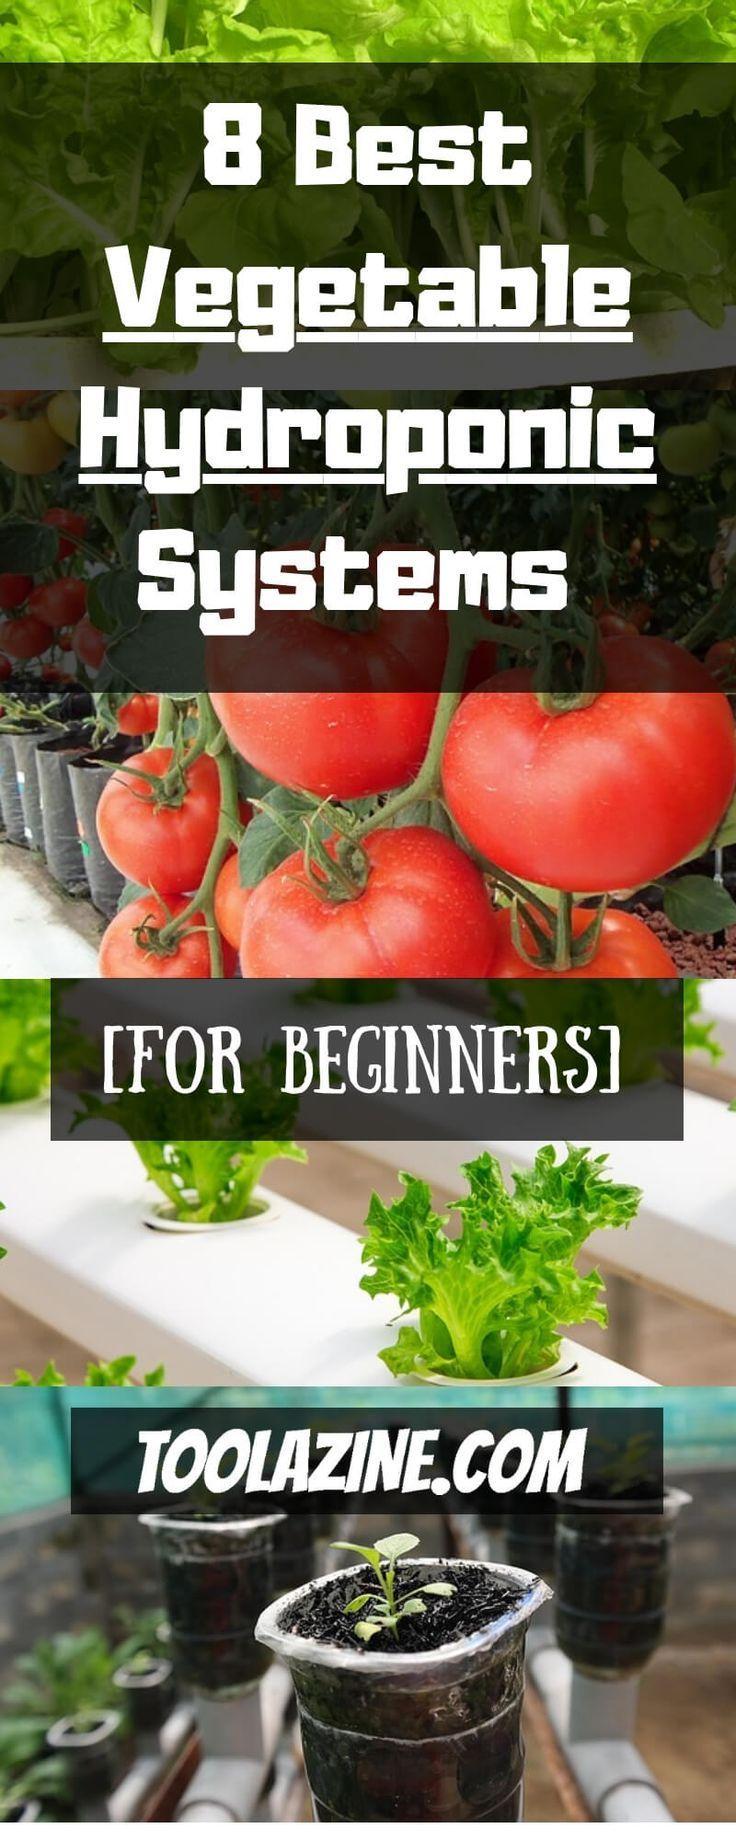 8 Best Vegetable Hydroponic Systems Für Anfänger 8 Best Vegetable Hydroponic Systems Für Anfänger ,